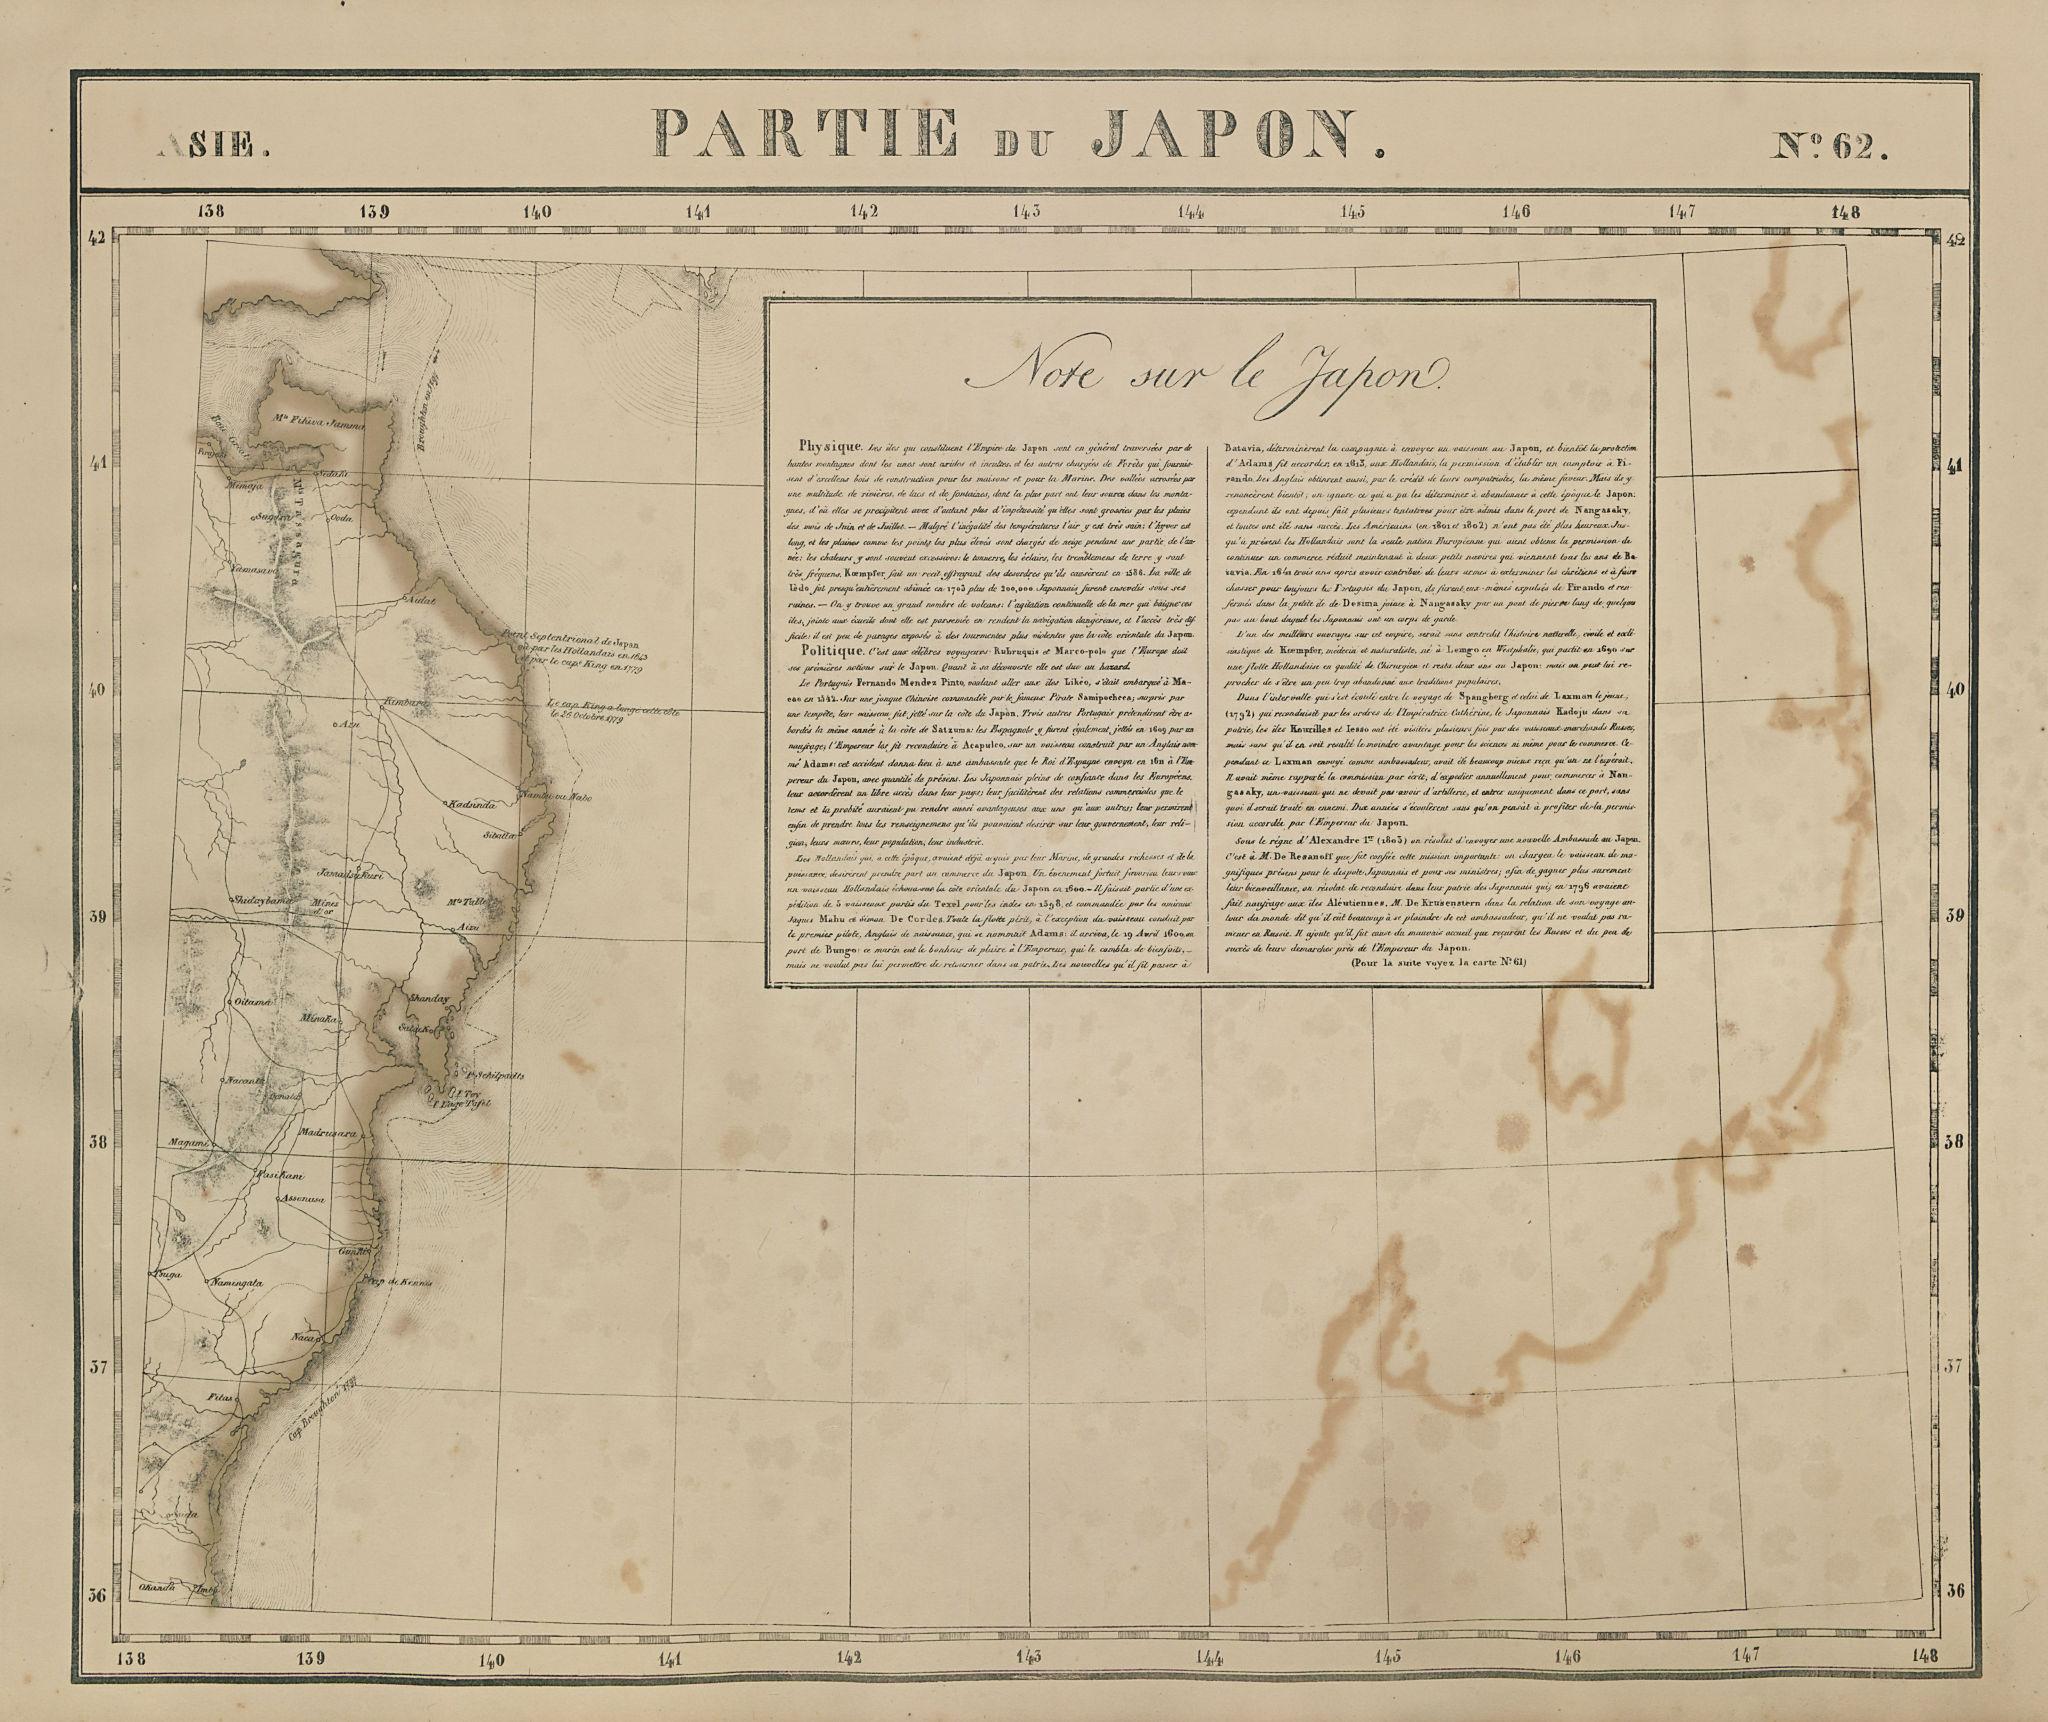 Asie. Partie du Japon #62 Japan. East-central Honshu coast VANDERMAELEN 1827 map